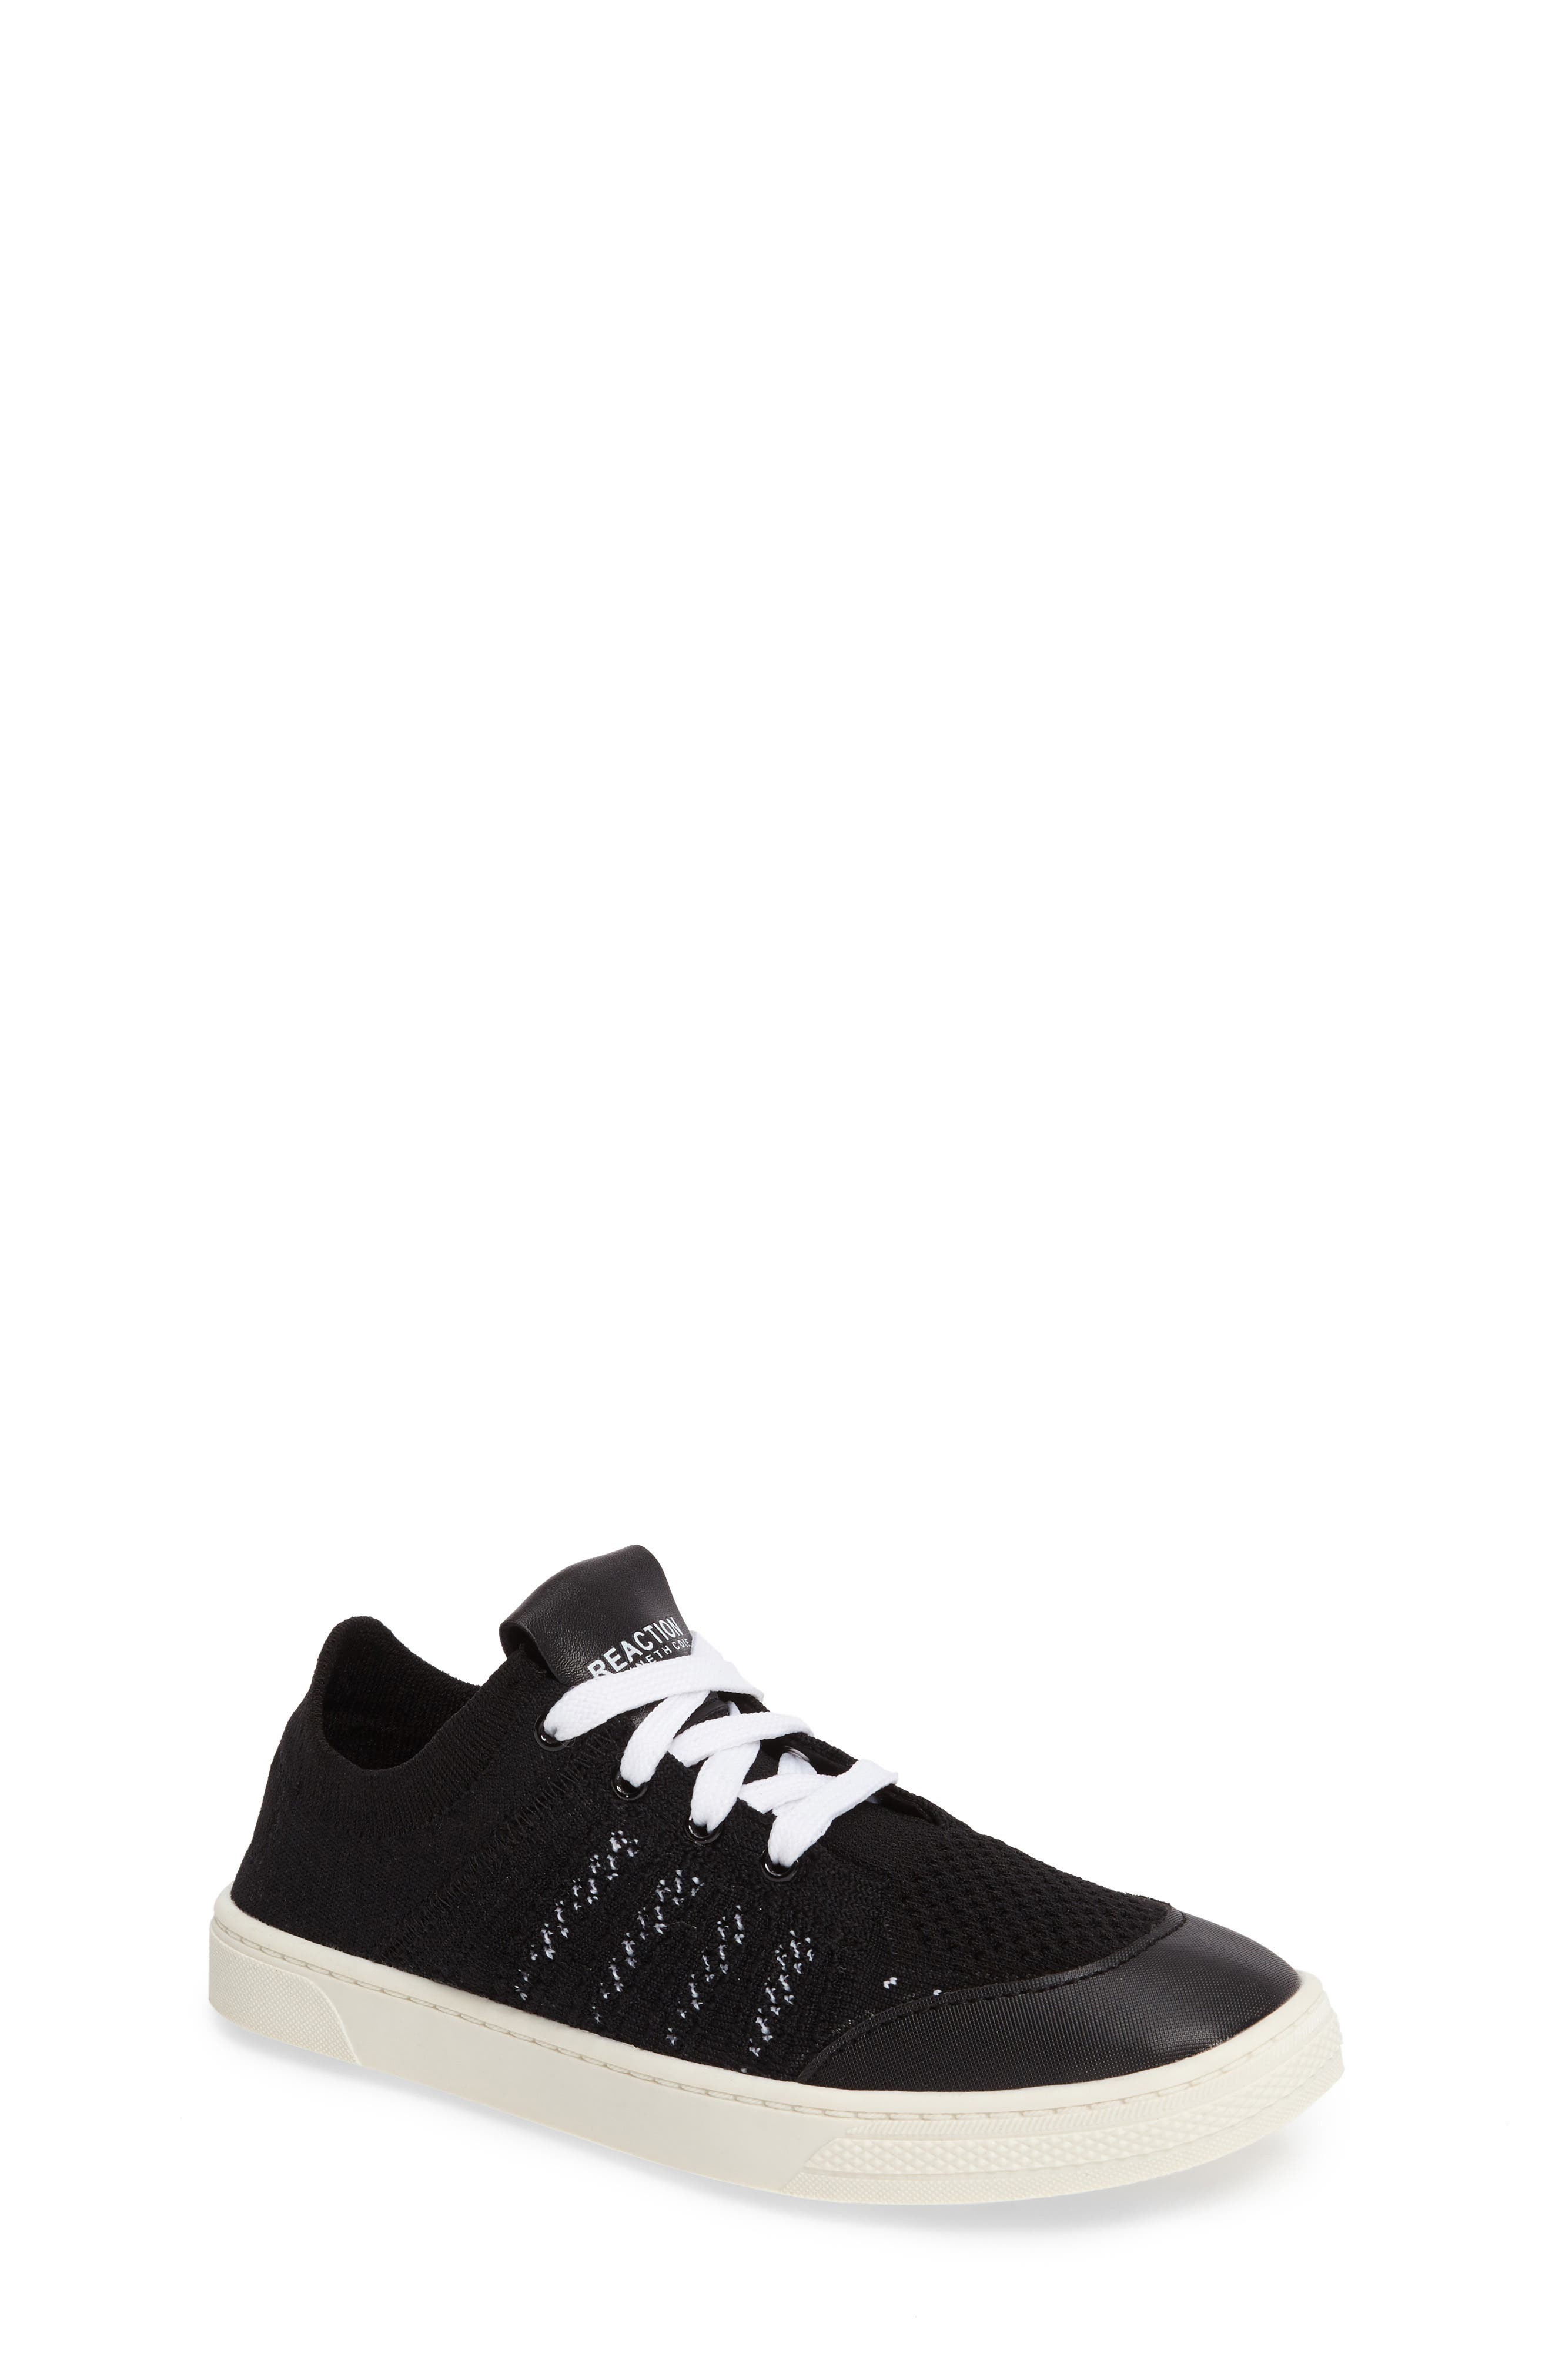 Kick Insight Woven Sneaker,                         Main,                         color, 001